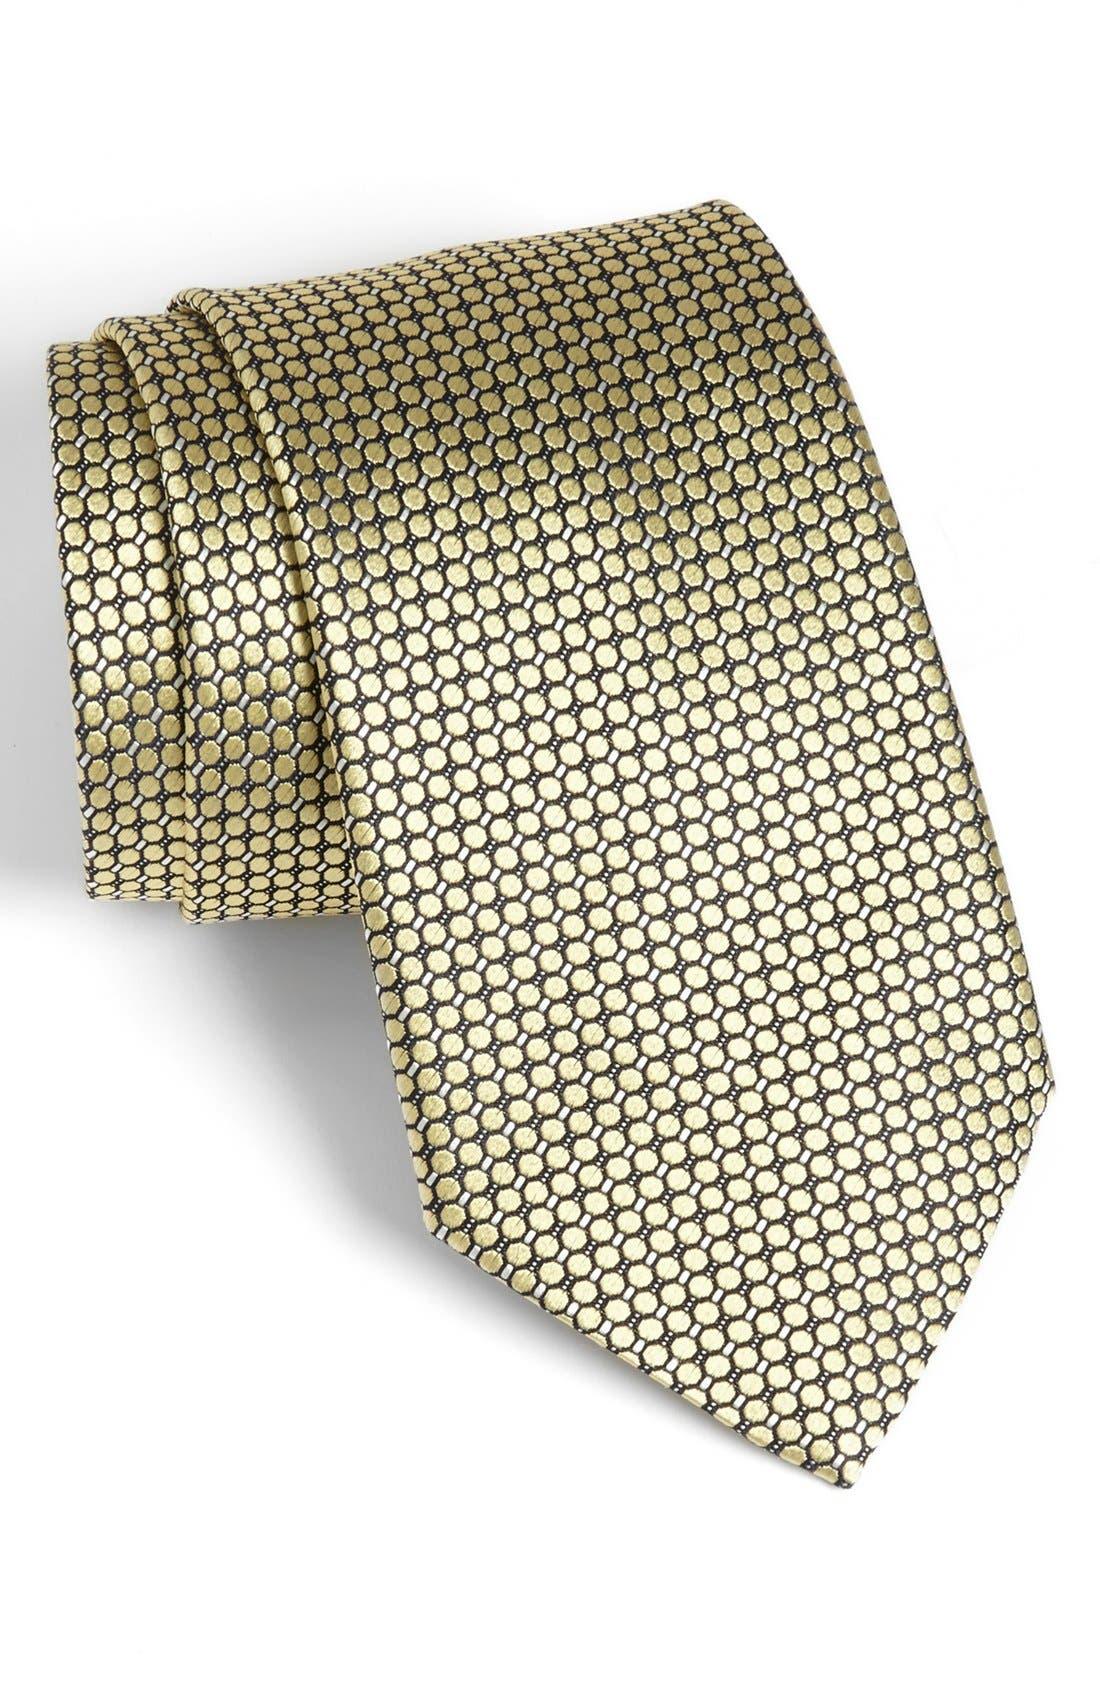 Main Image - Ermenegildo Zegna Solid Circle Grid Woven Silk Tie